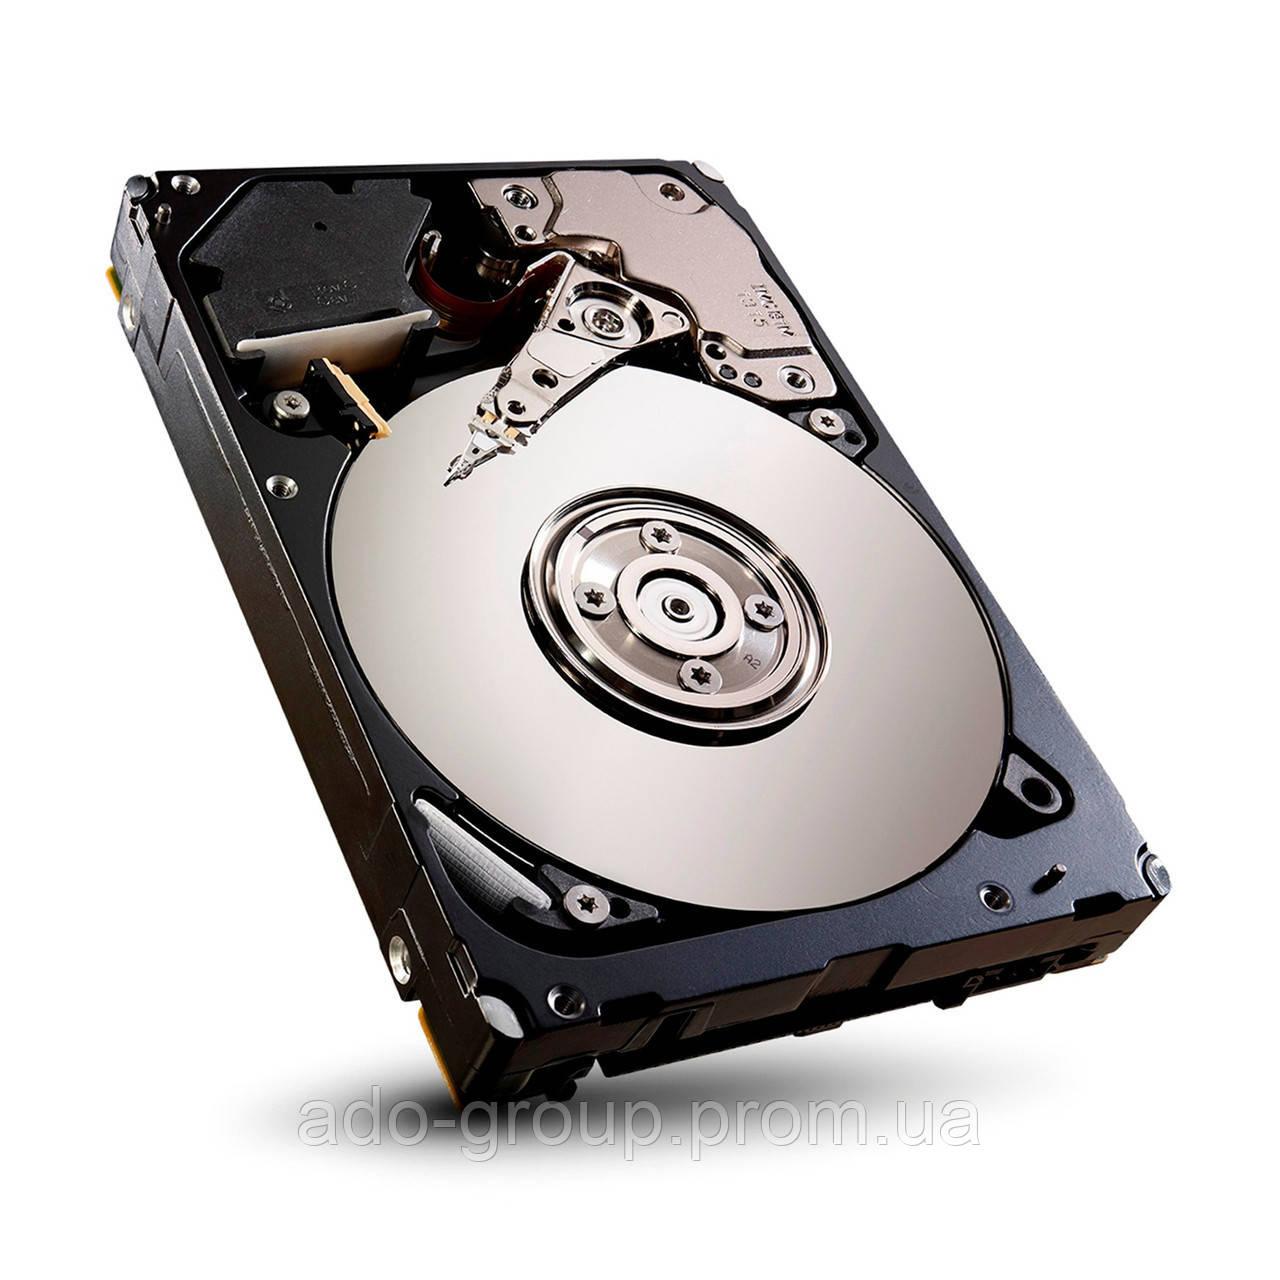 "W350K Жесткий диск Dell 2000GB SAS 7.2K  3.5"" +"